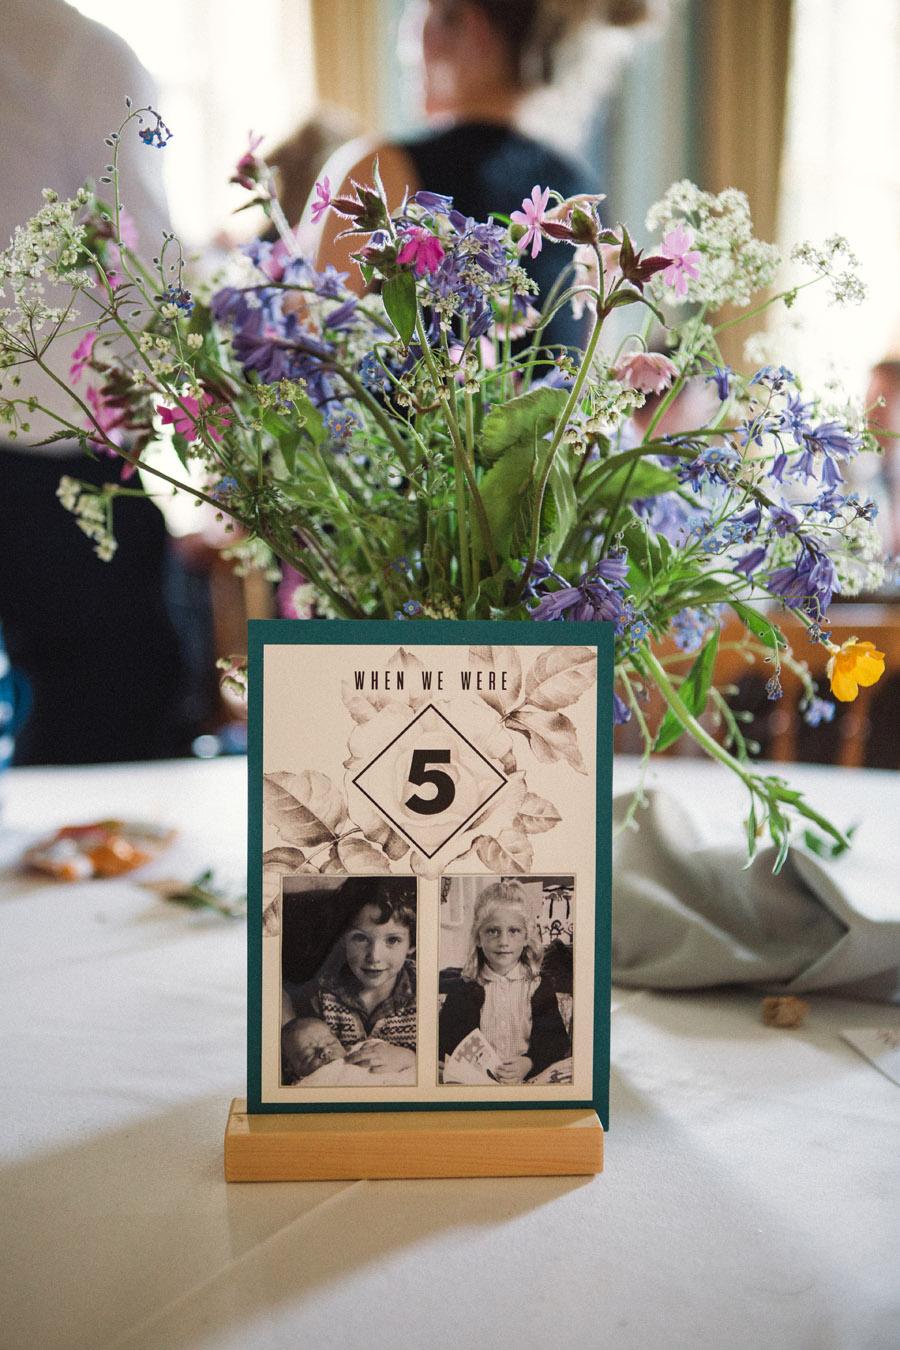 wildflowers wedding in devon, image credit Emma Stoner Photography (38)